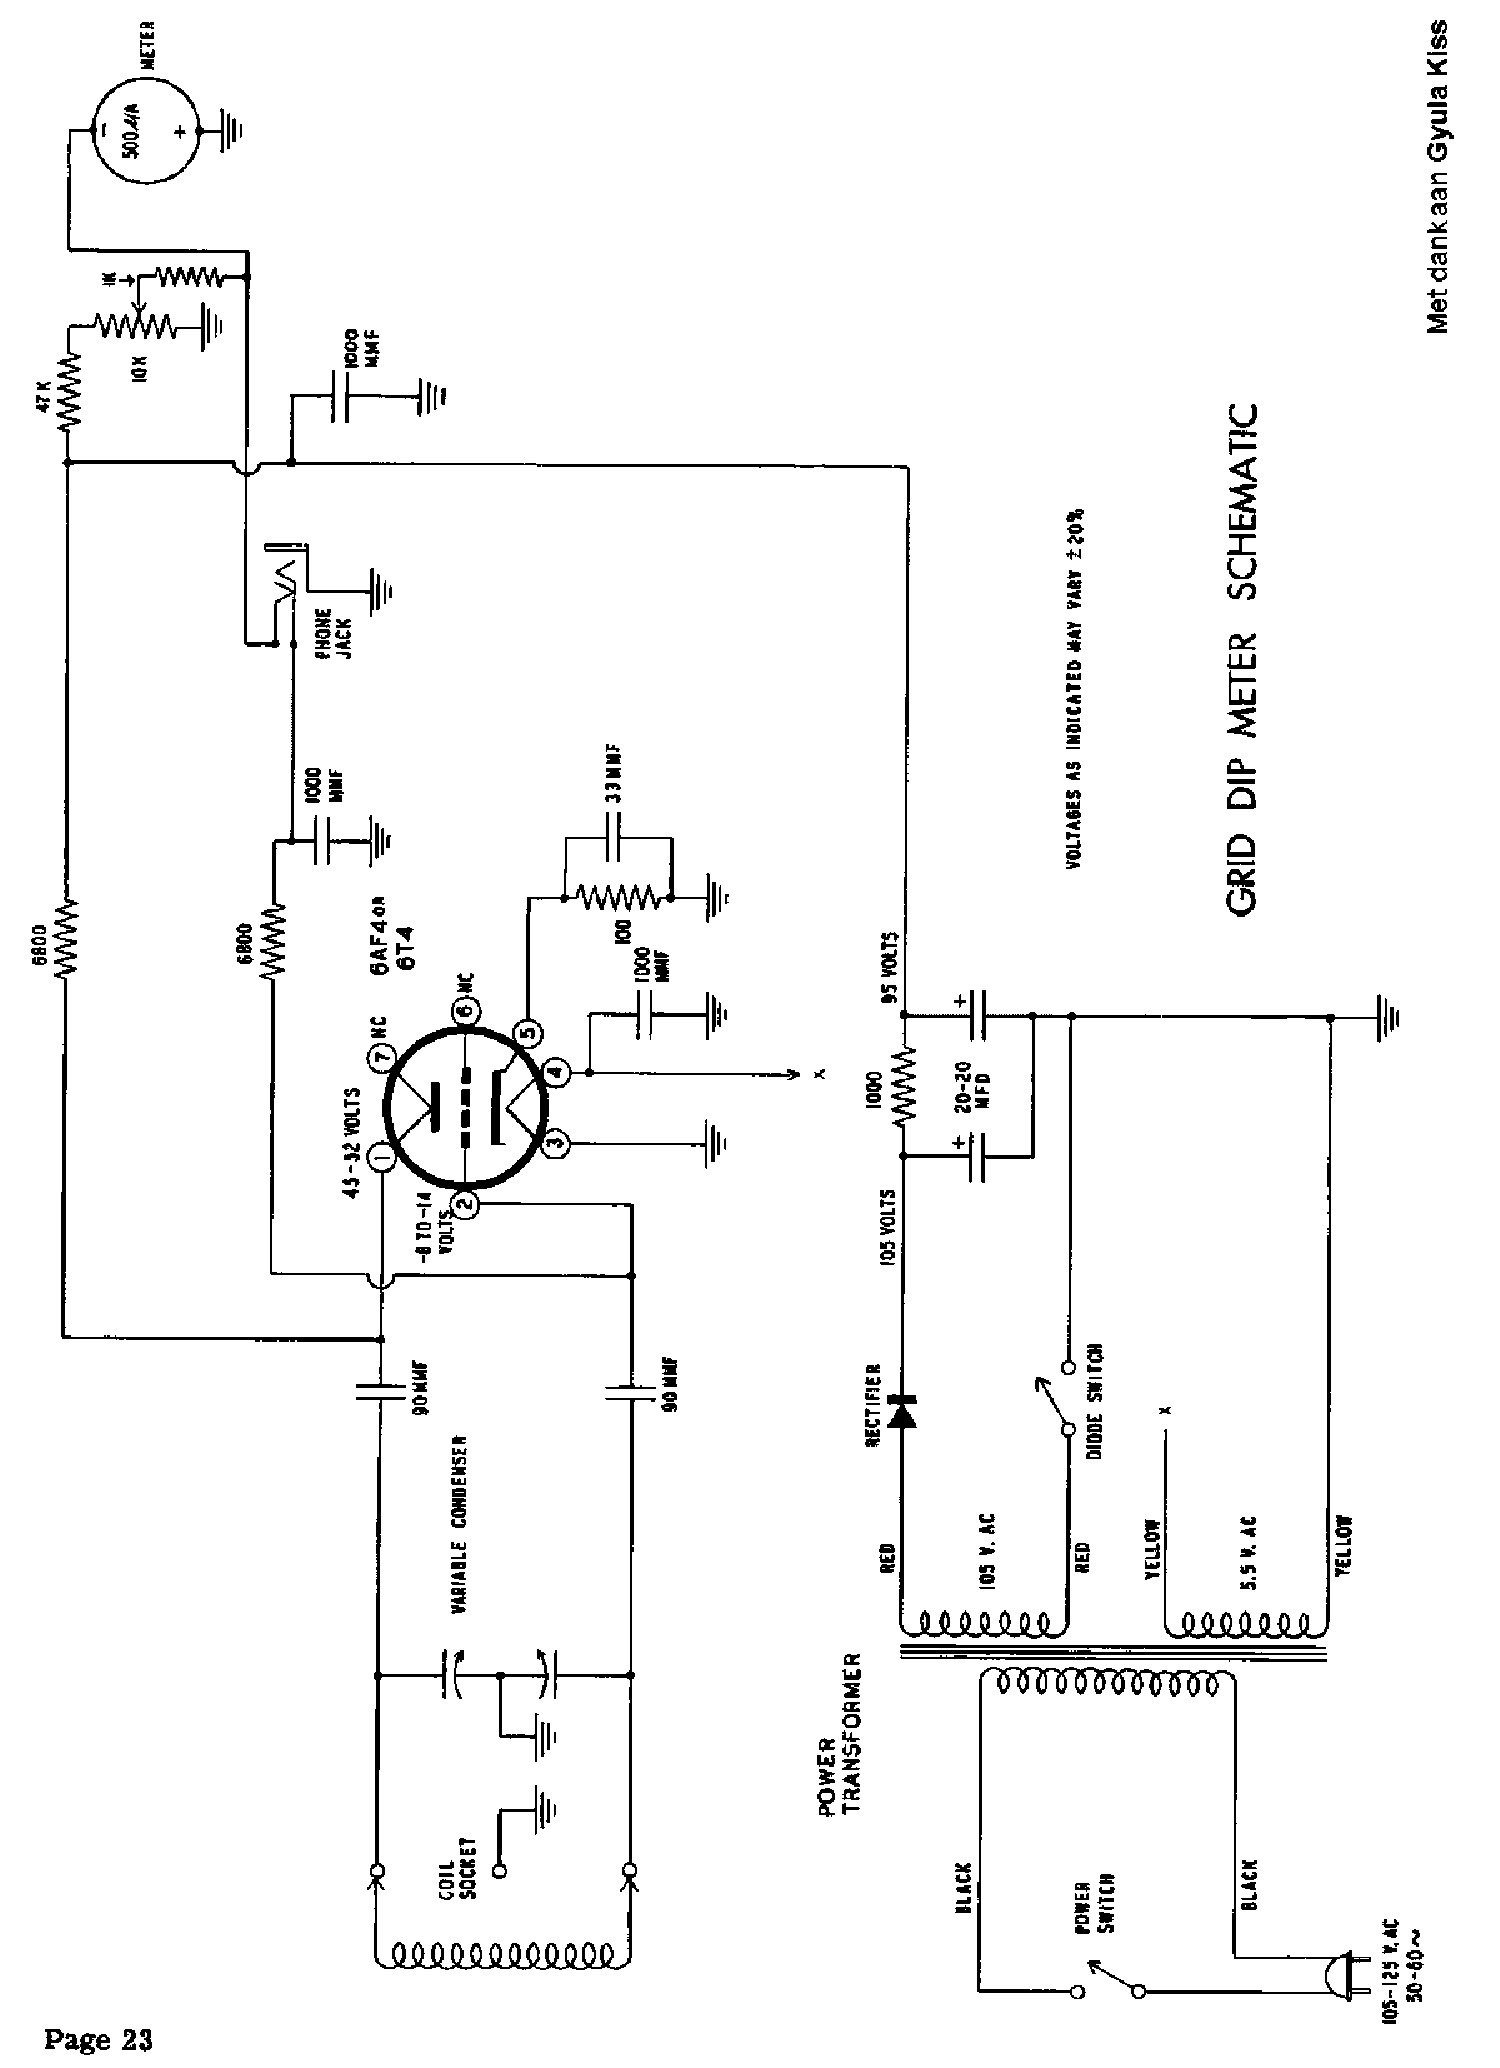 Heathkit Gd1b 2